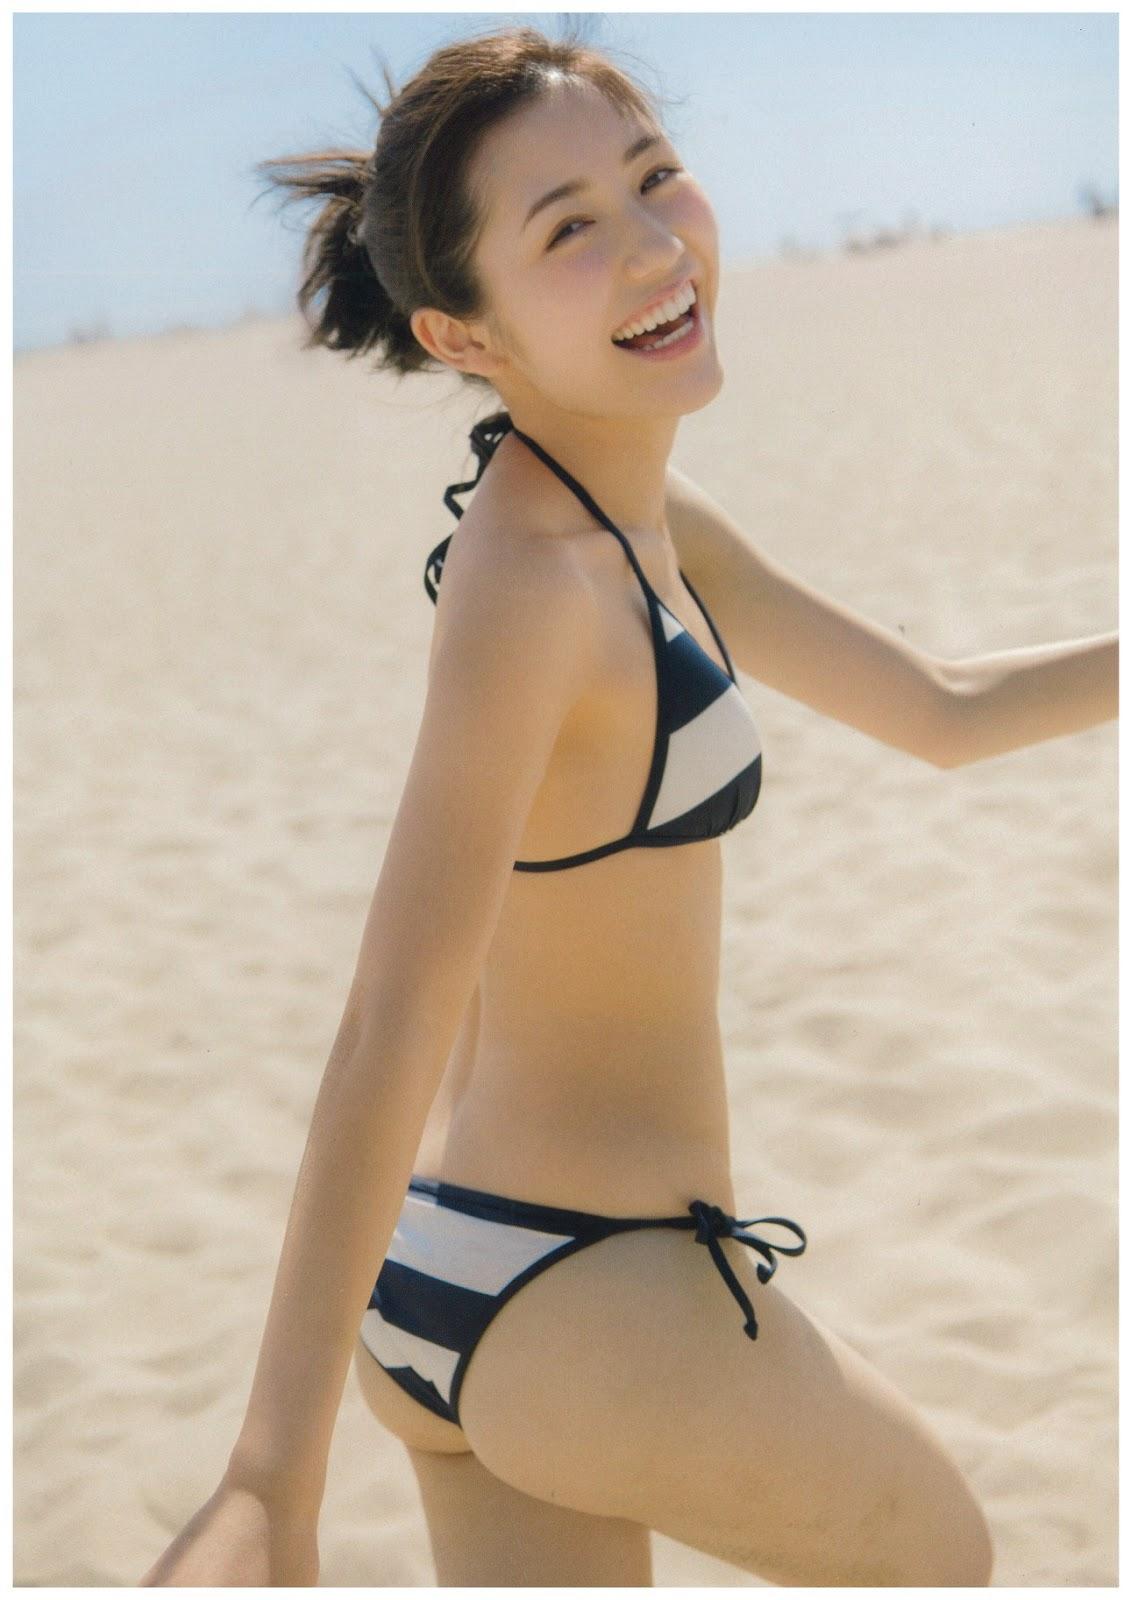 Watanabe Mayu 渡辺麻友 AKB48, Photobook 知らないうちに (Shiranai Uchi Ni) Part04